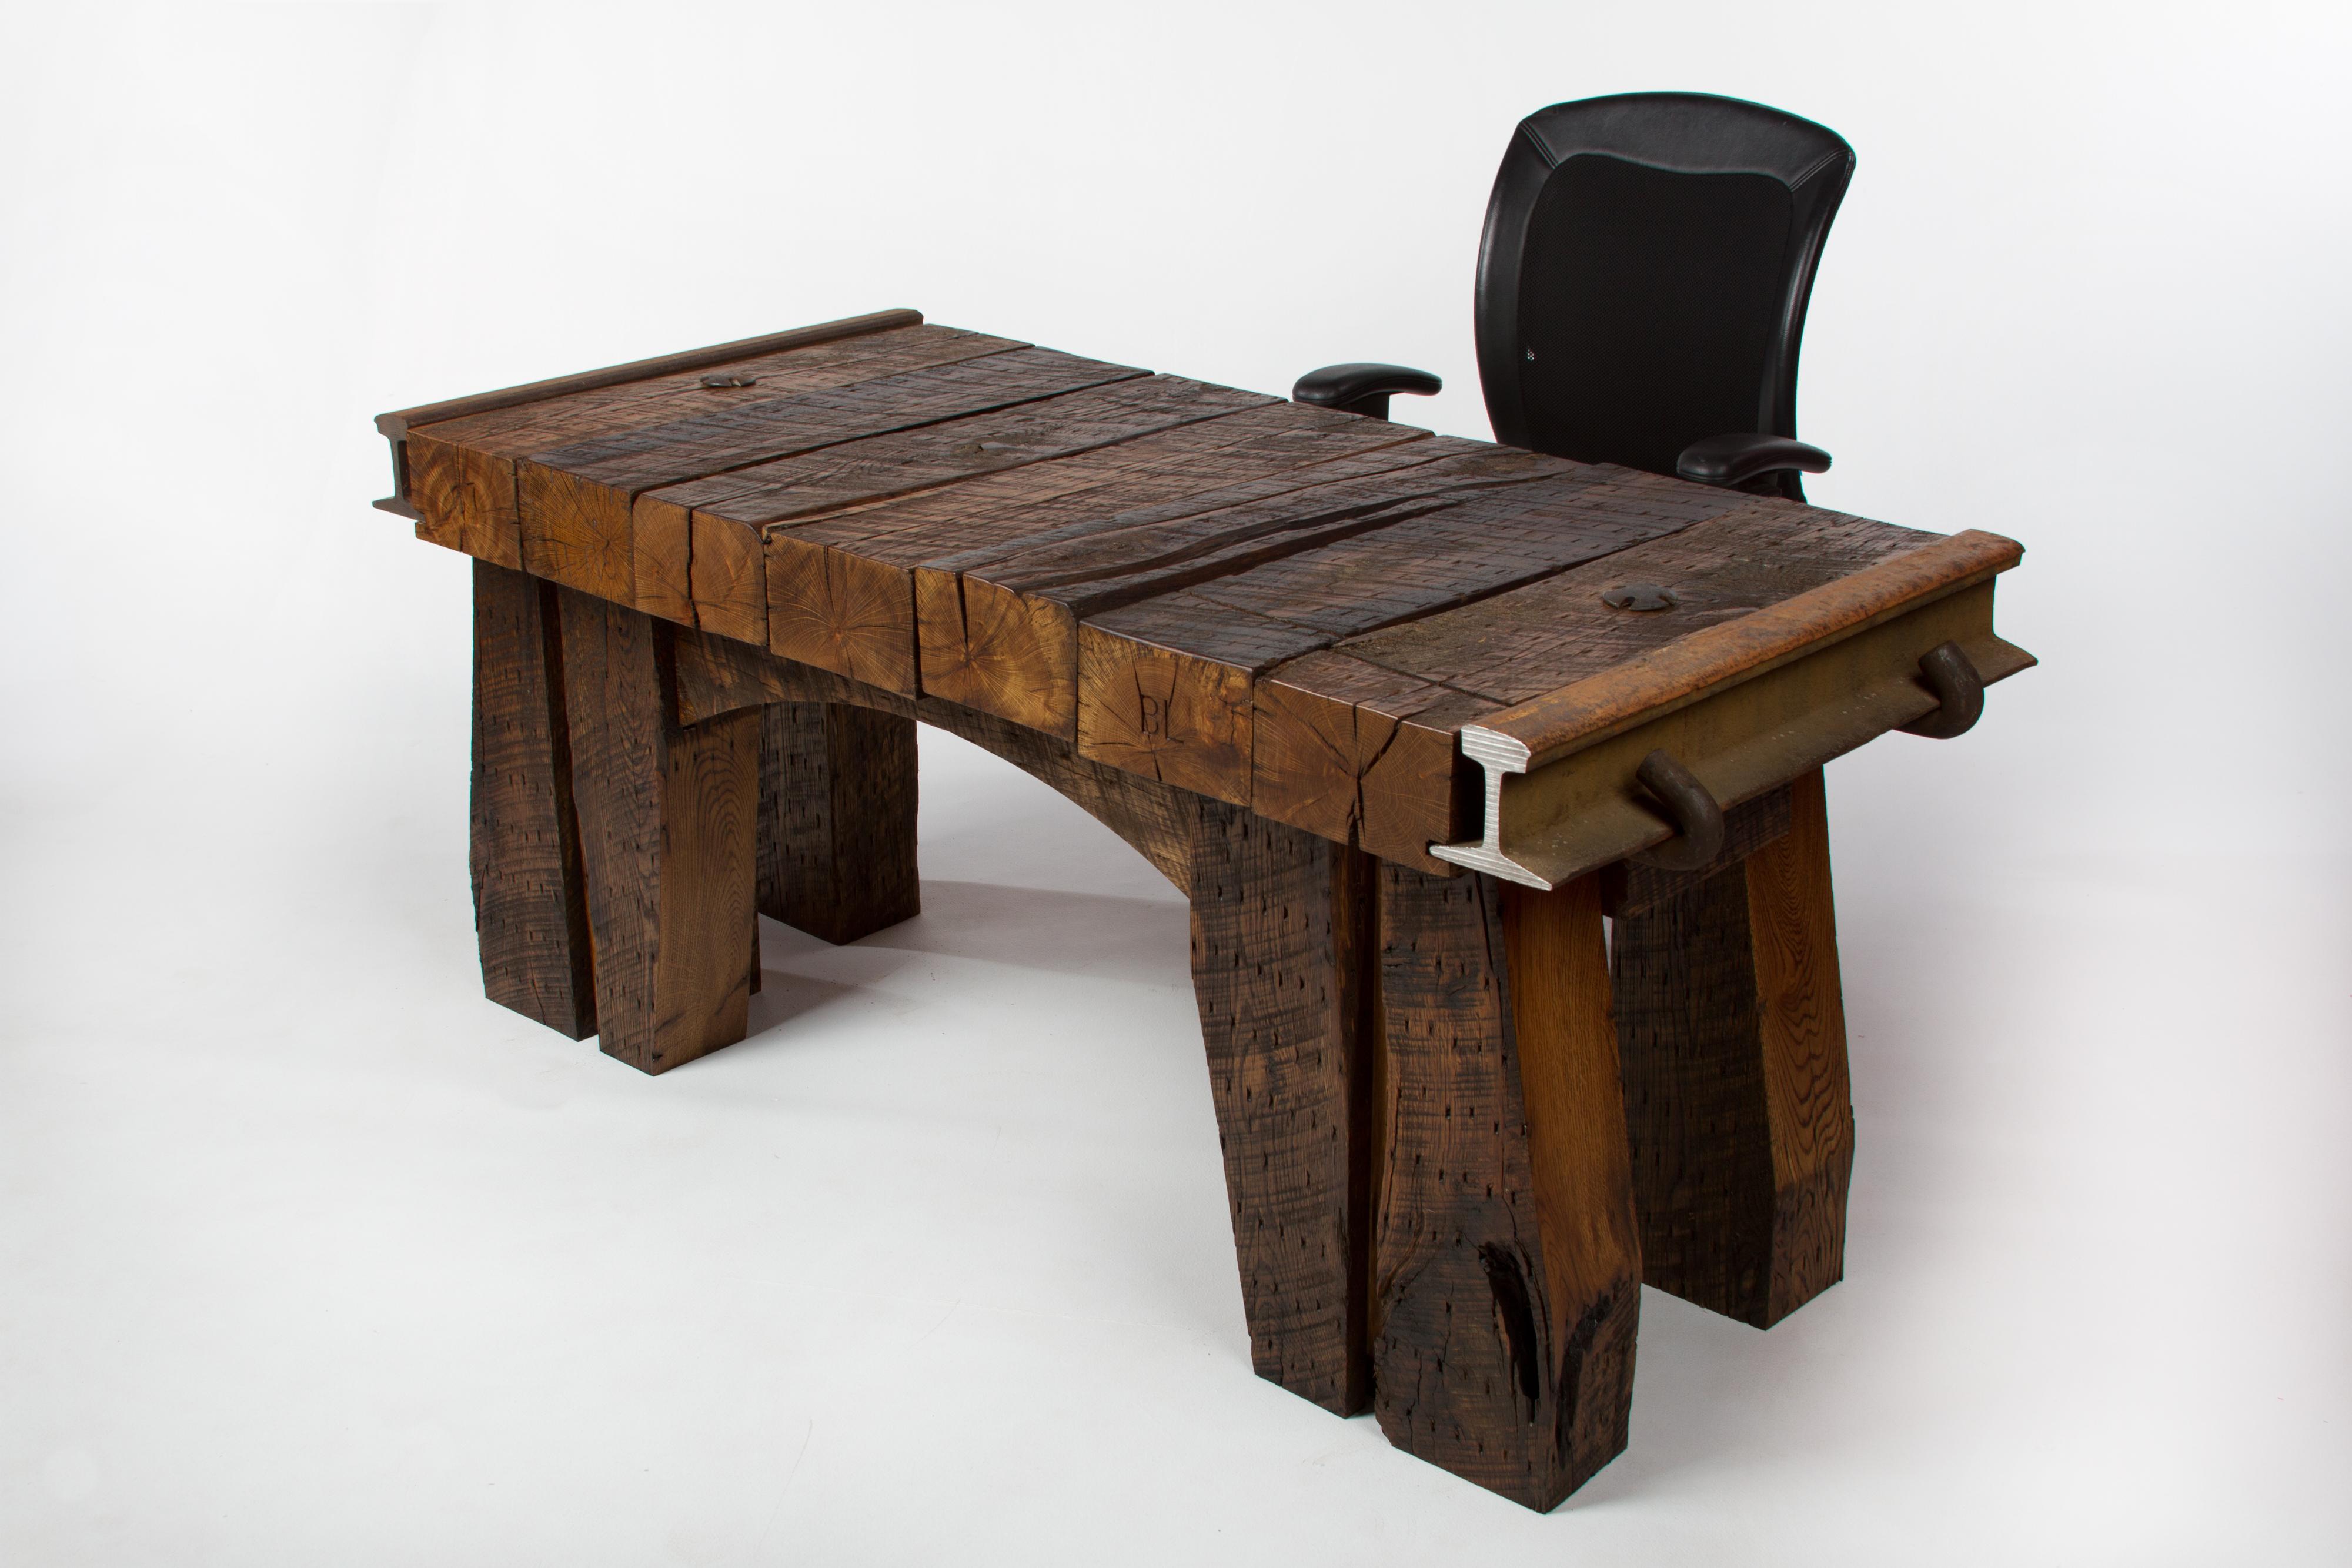 ... Timbertop Desk From Rail Yard Studios ...